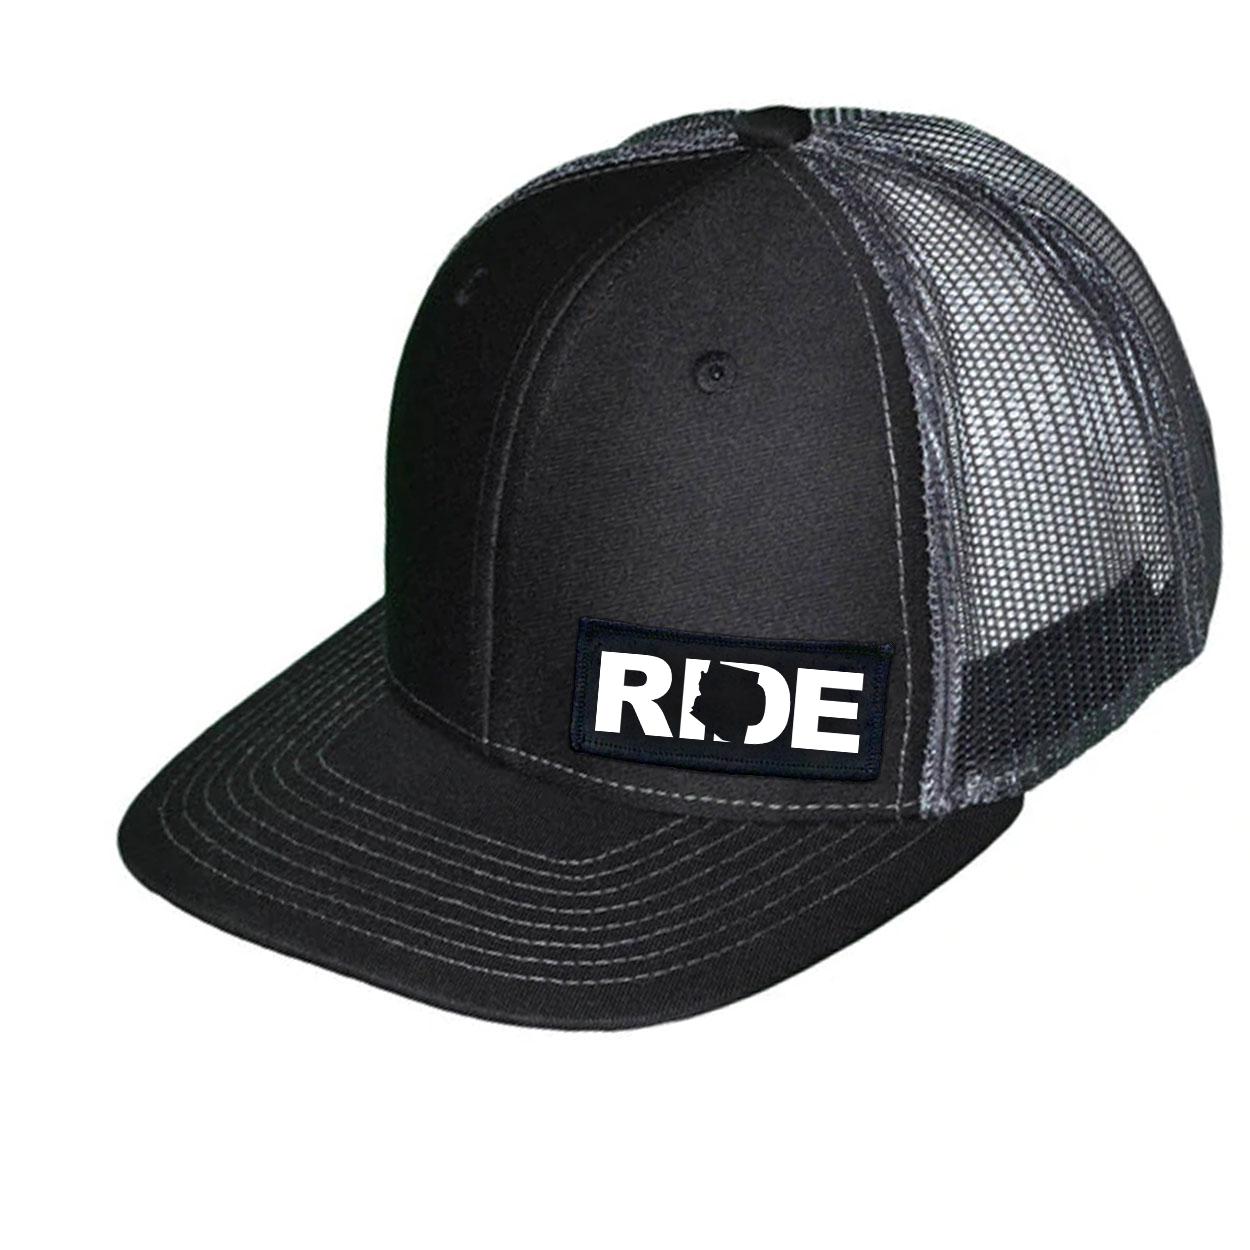 Ride Arizona Night Out Woven Patch Snapback Trucker Hat Black/Dark Gray (White Logo)